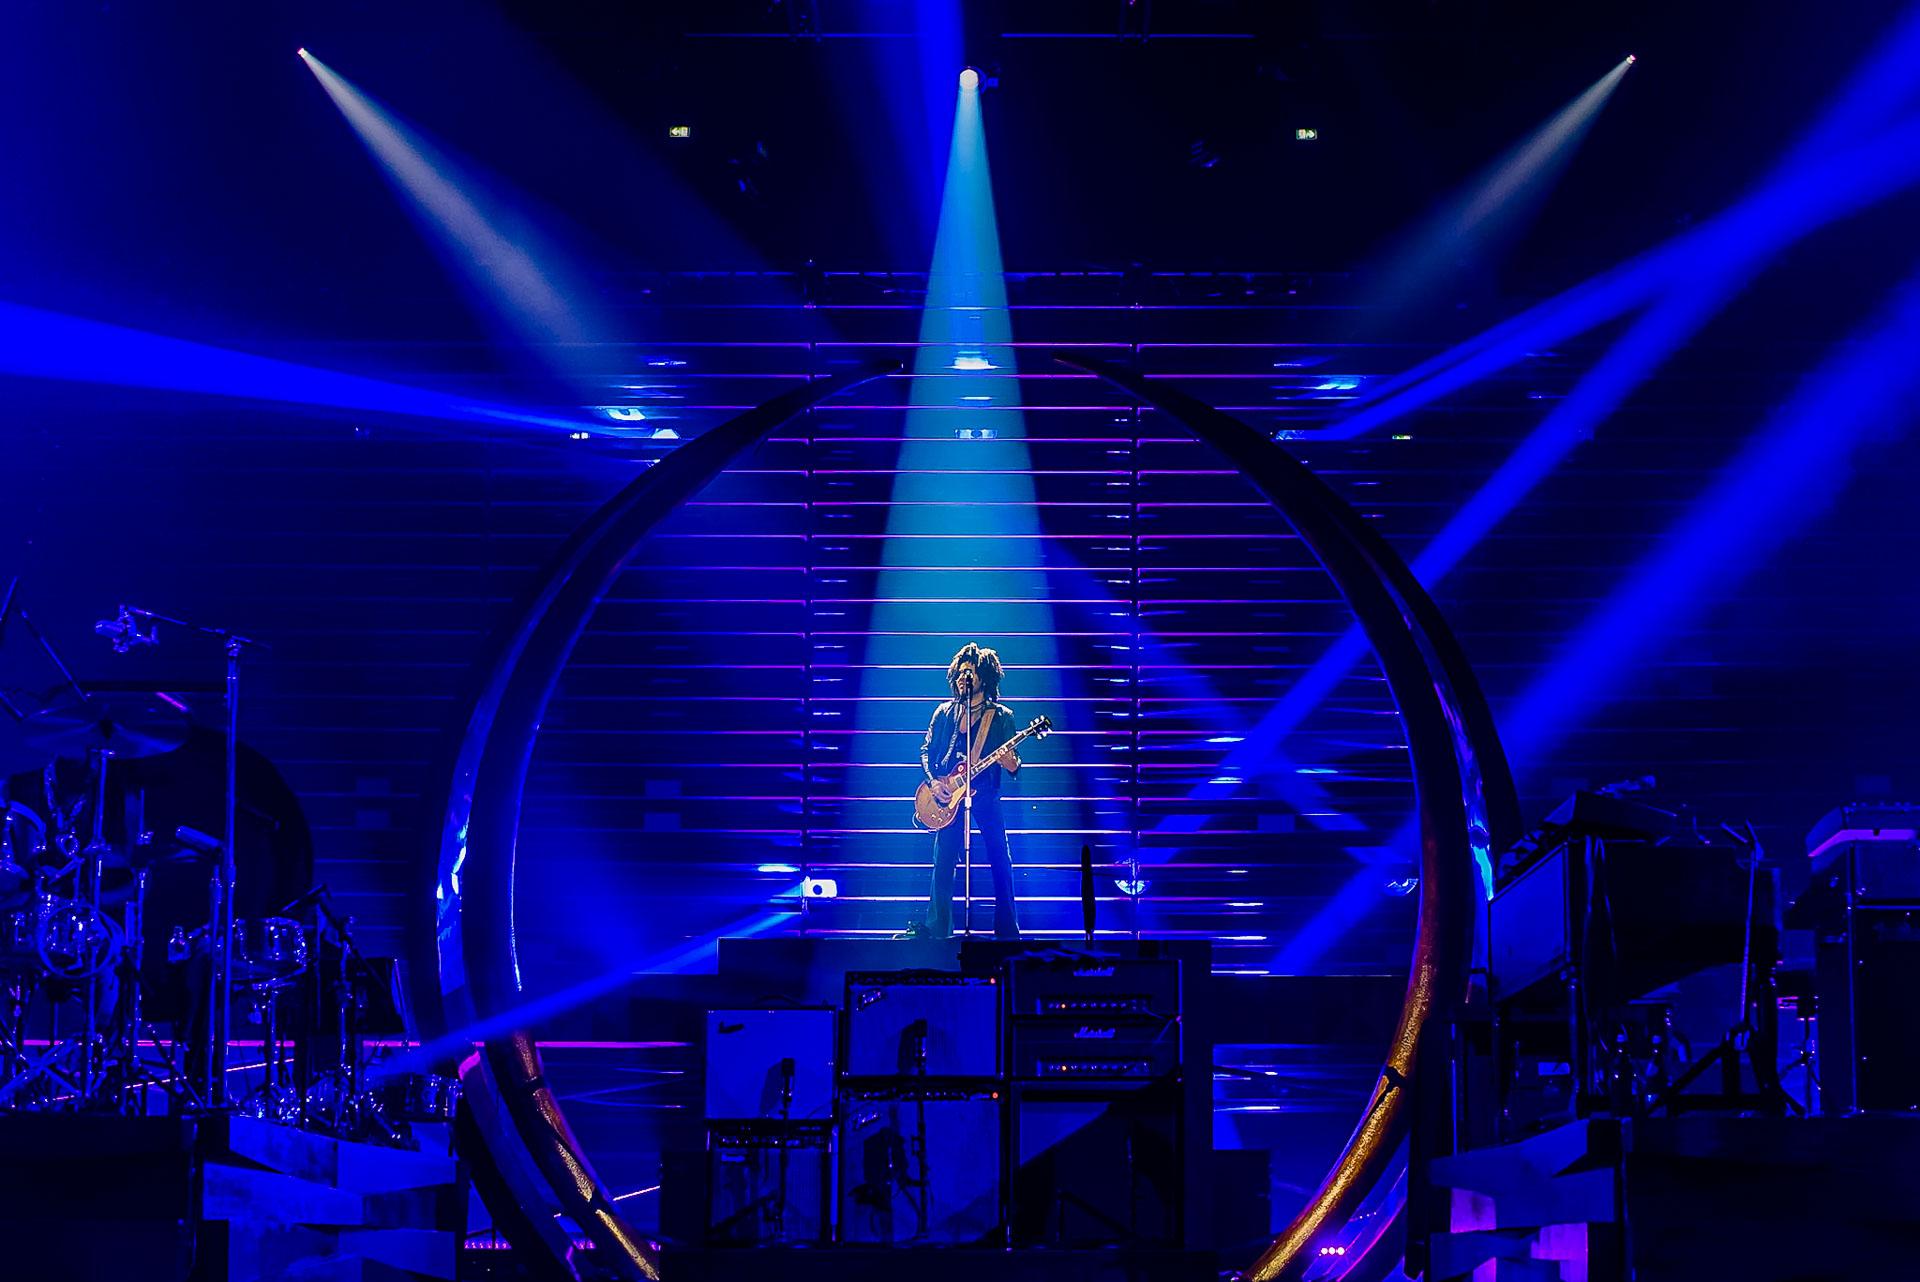 Poze: Cum a fost la… concertul Lenny Kravitz de la BT Arena